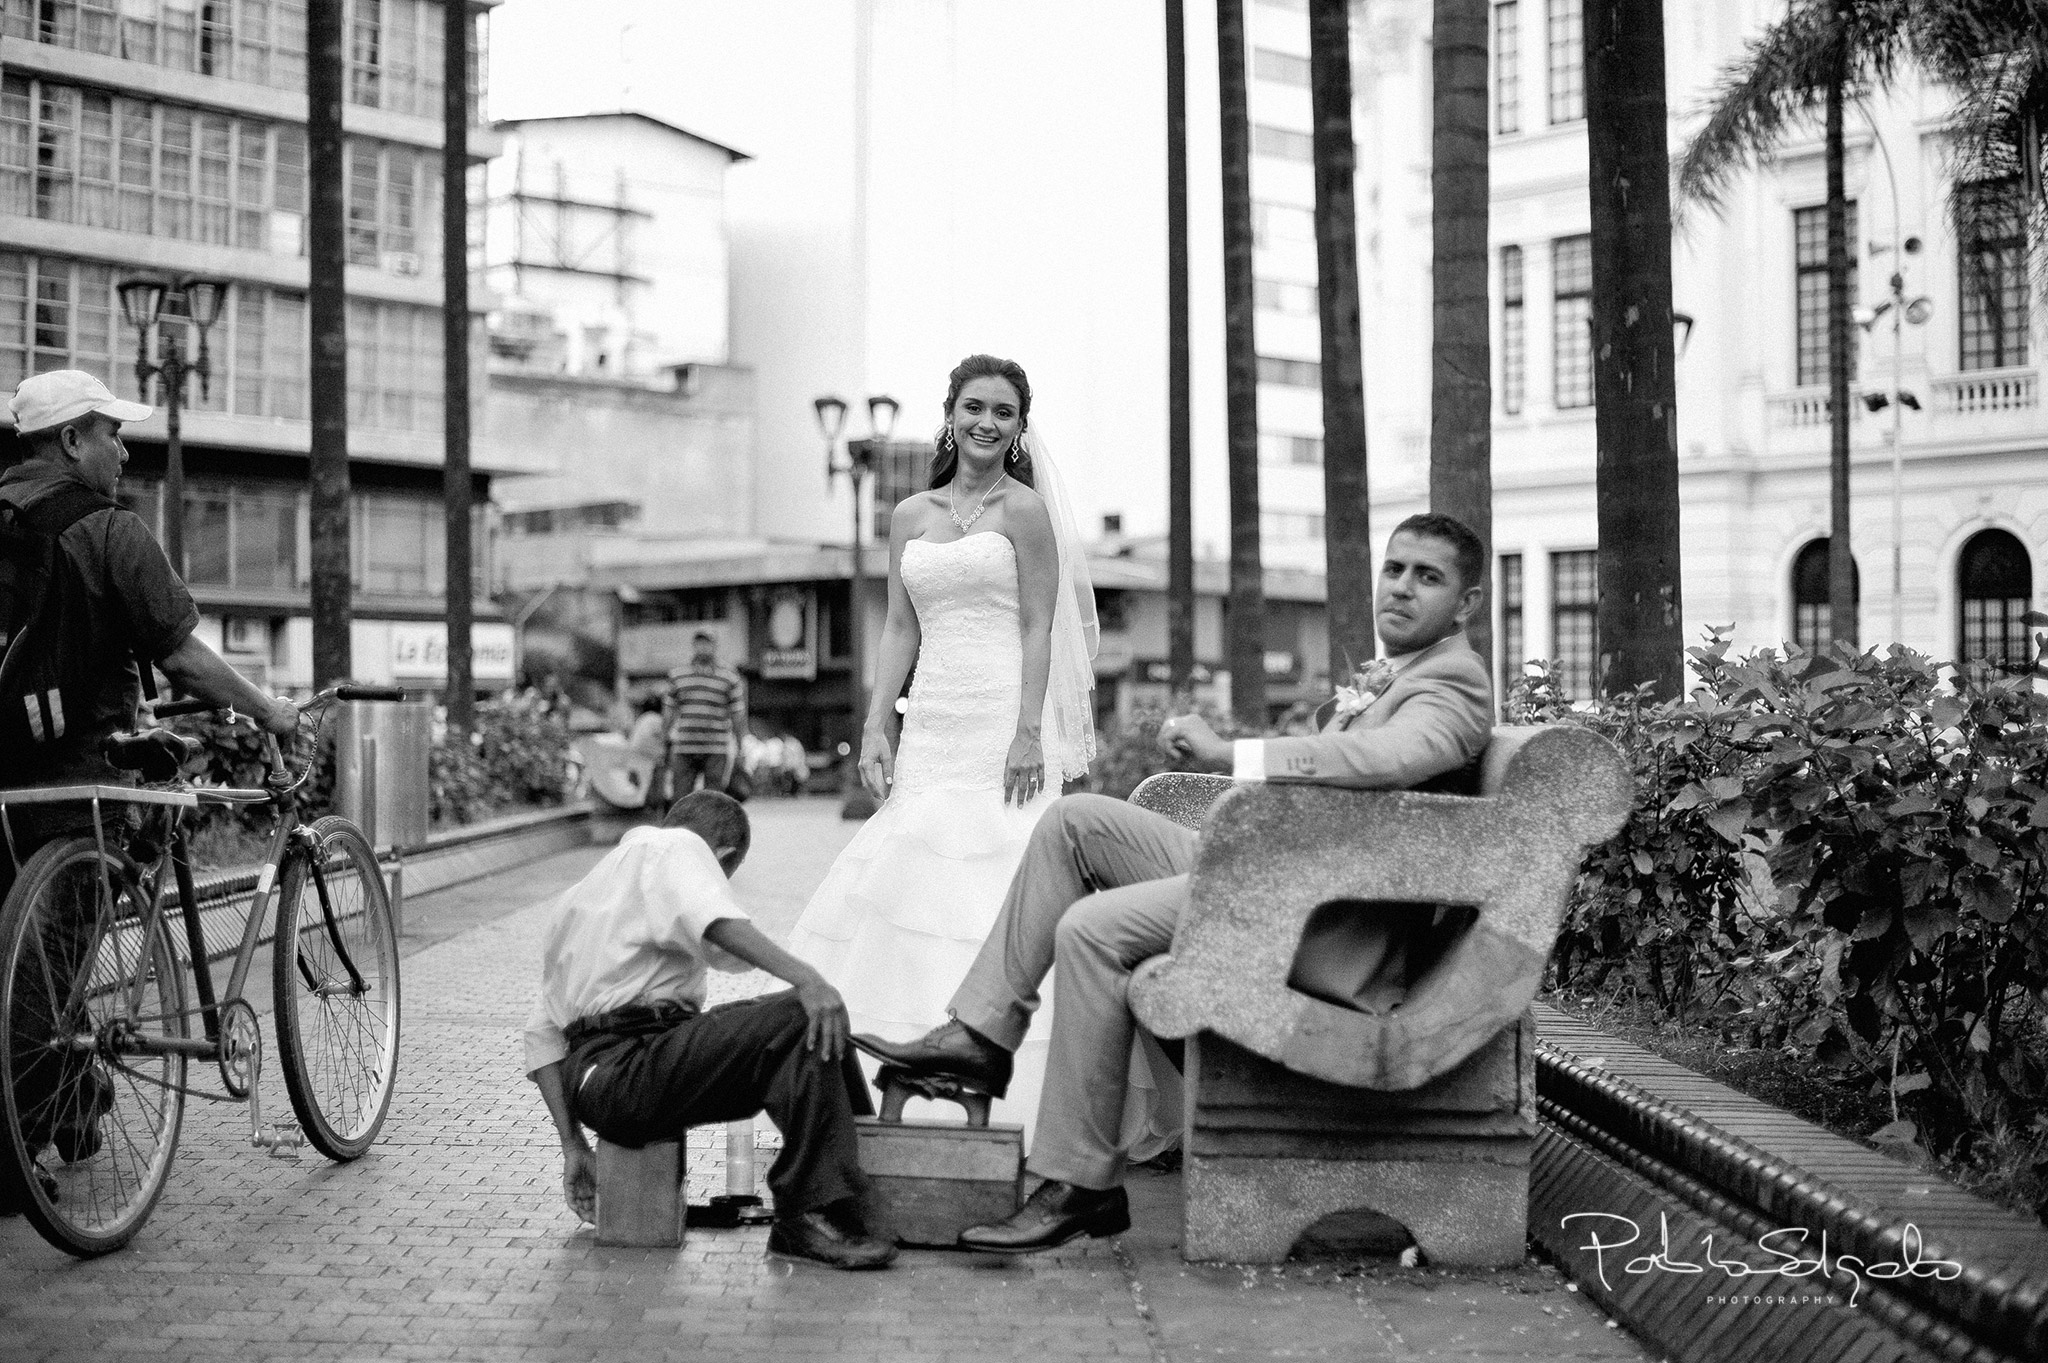 boda-en-cali_PSB3787ed.jpg